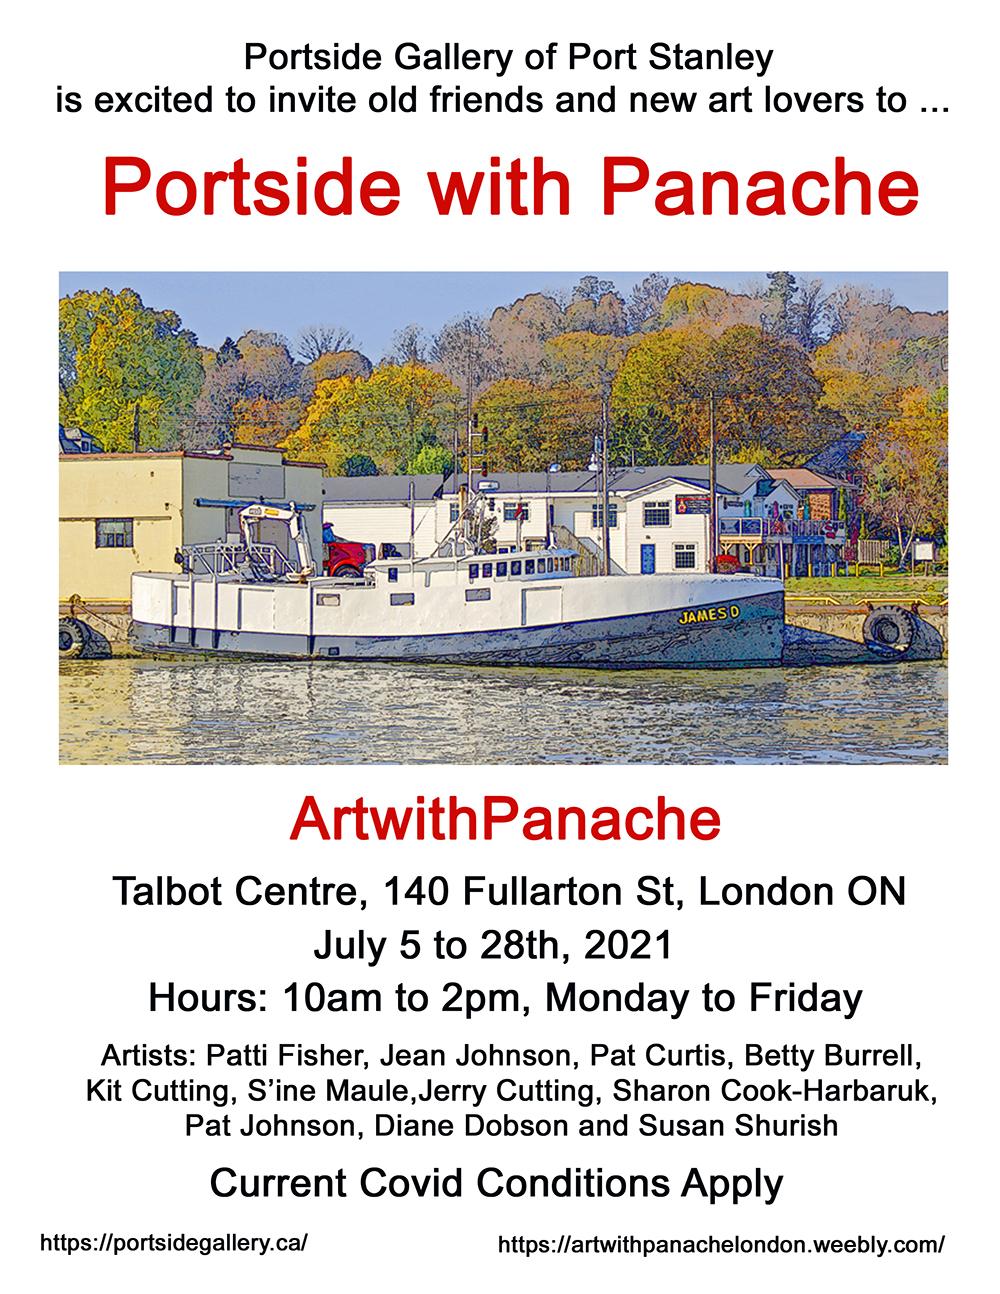 Portside with Panache 2 master